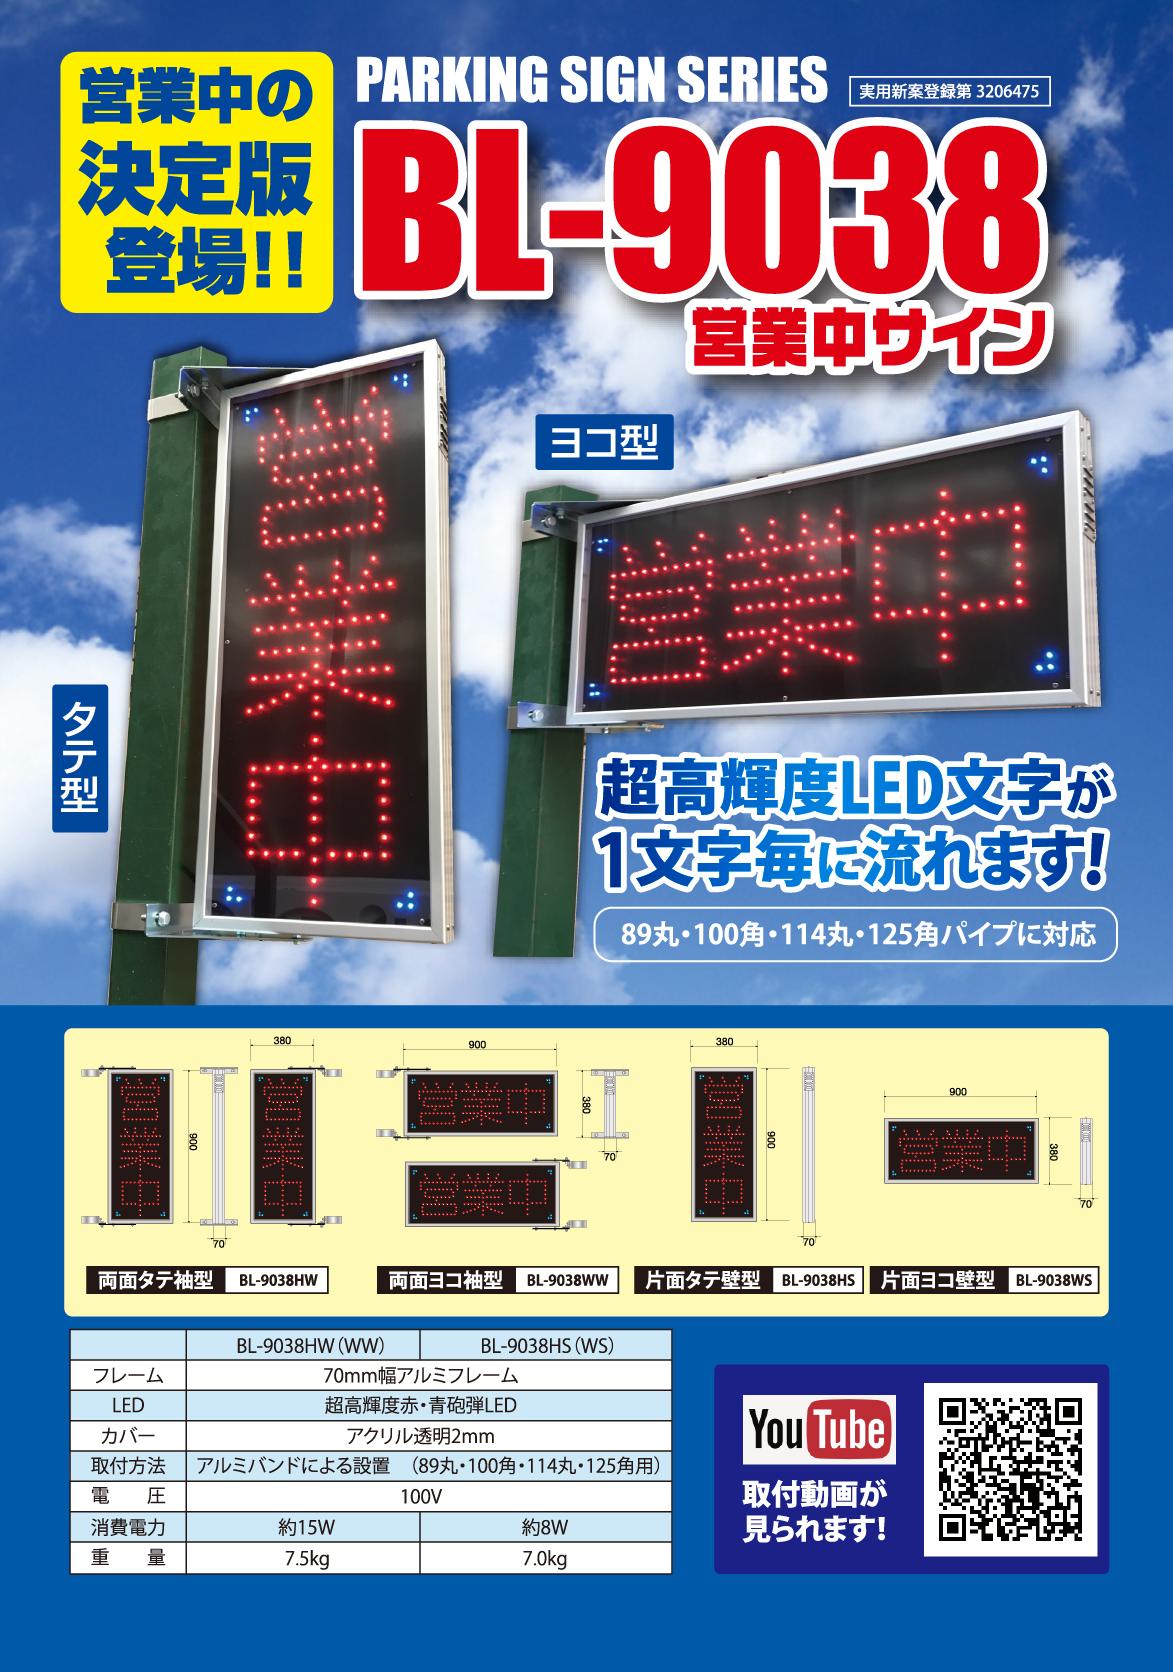 BL-9038 高輝度な赤色LEDでお店をアピールする営業中サインのご紹介画像です。